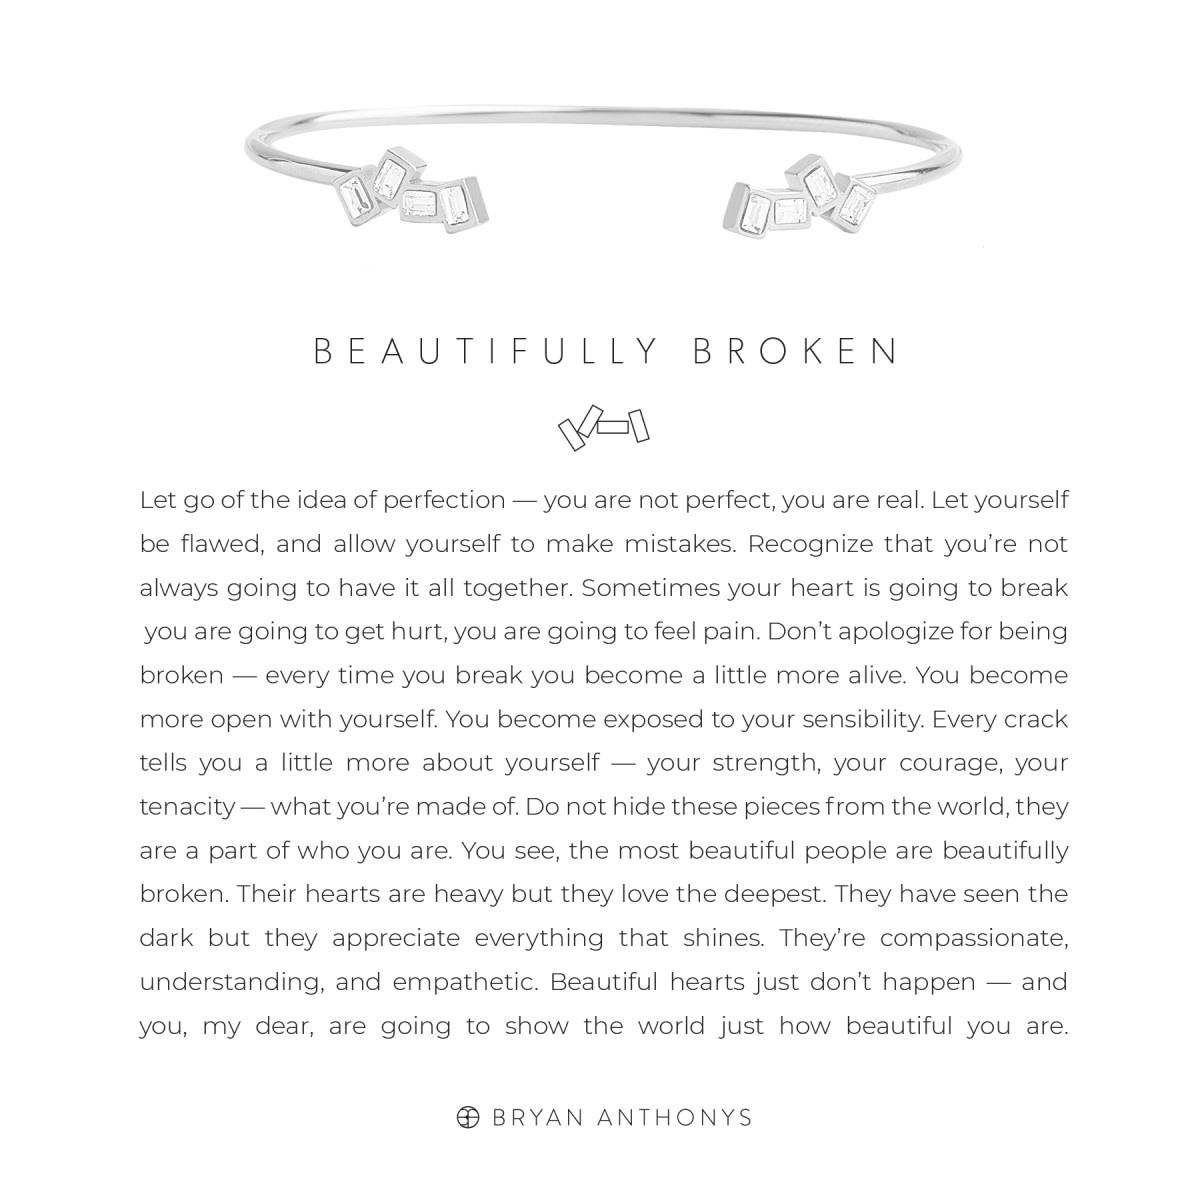 Bryan Anthonys Bryan Anthonys Beautifully Broken Cuff